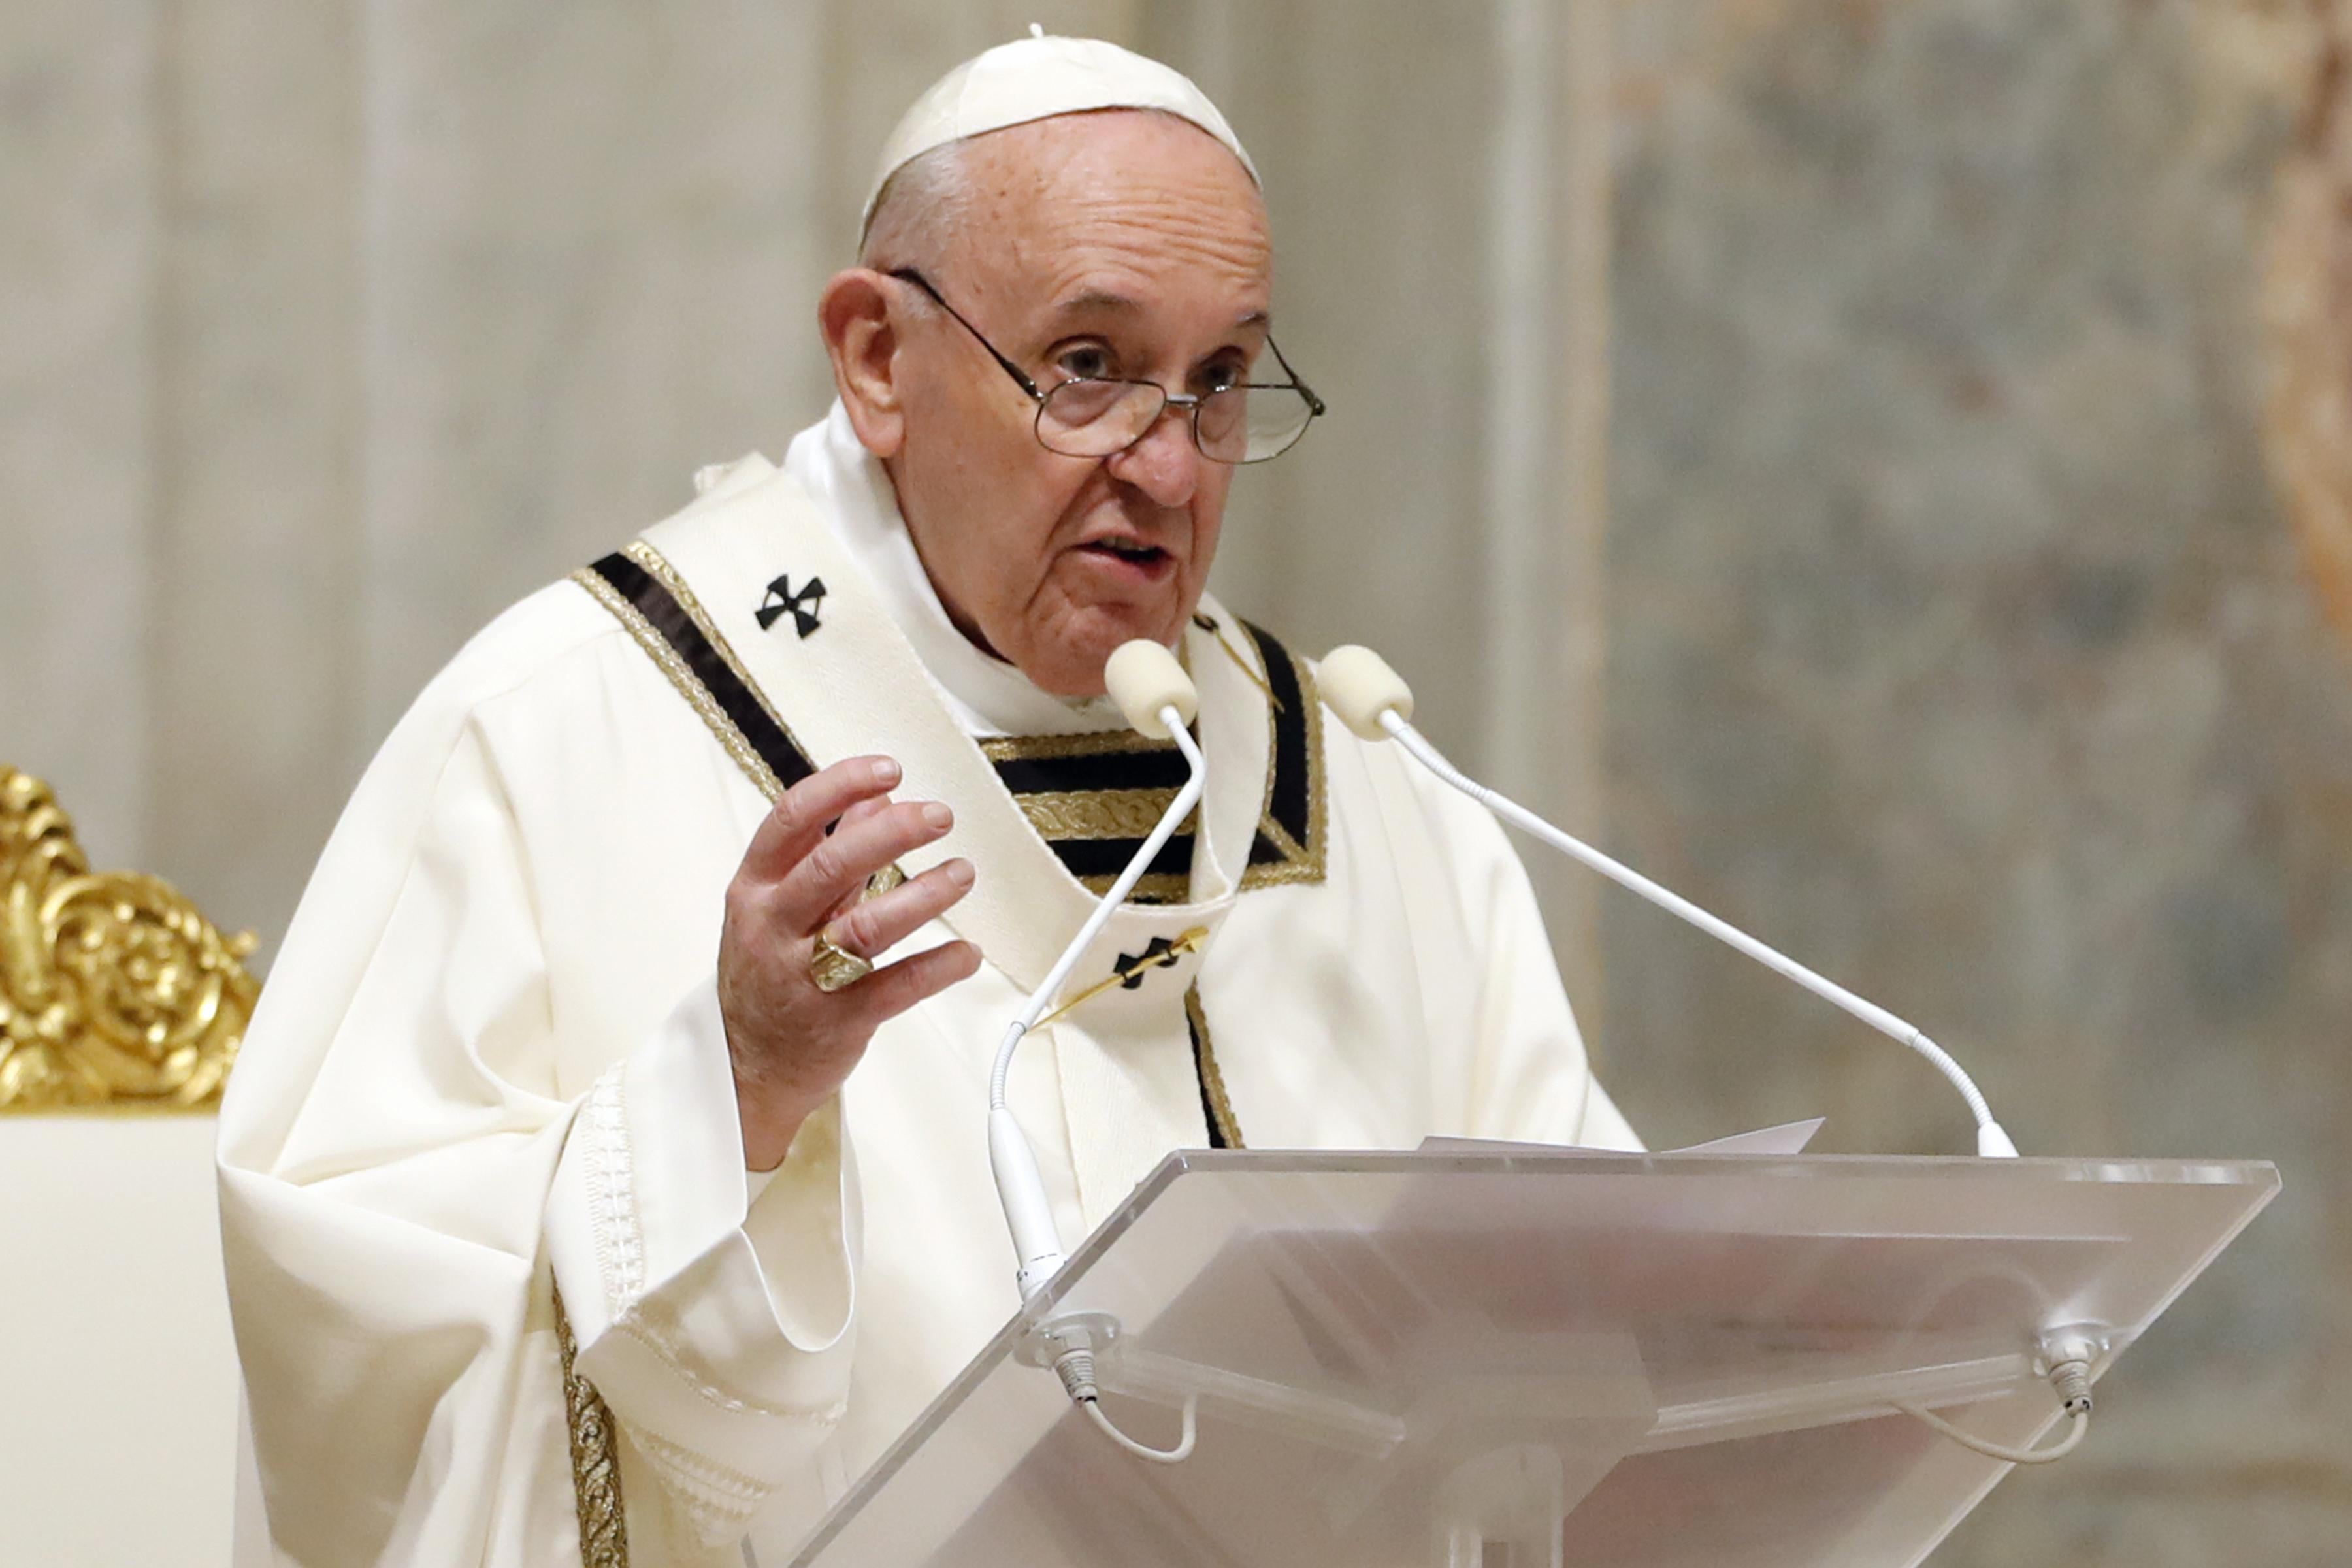 amapr1120-pope-francis-easter-vigil-afp-000_1qj7pw